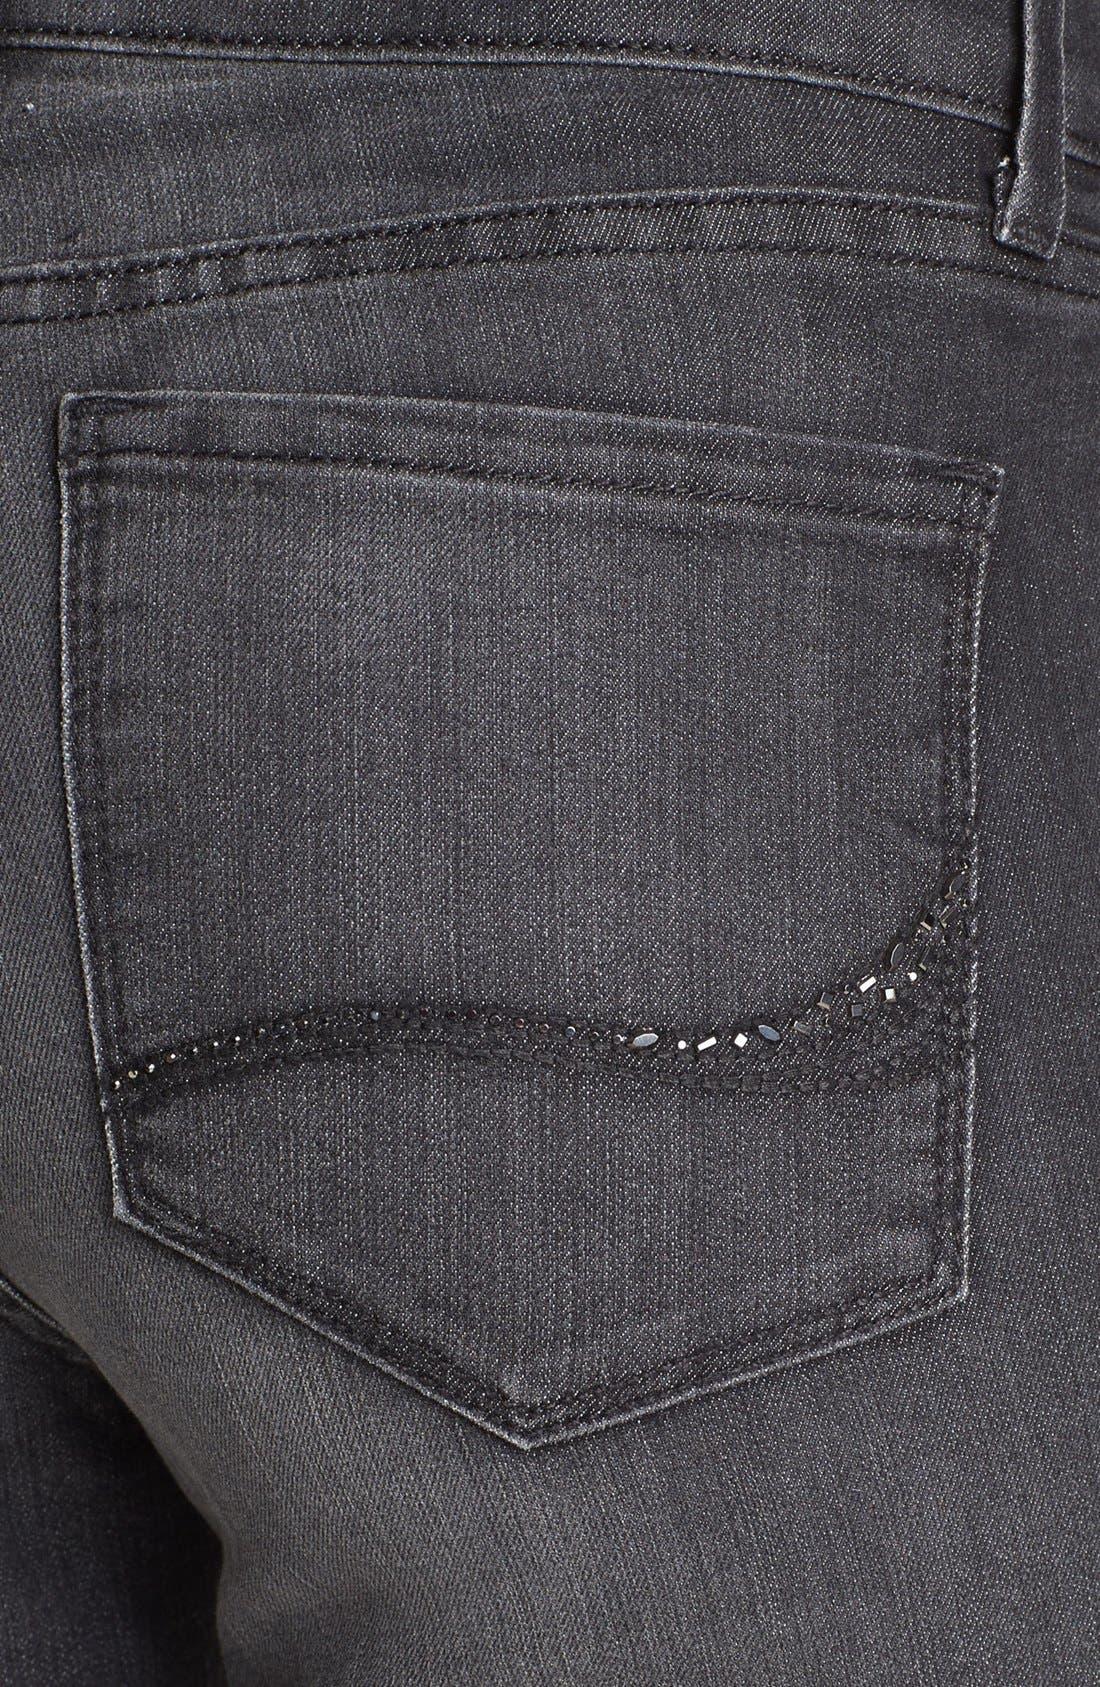 Alternate Image 3  - NYDJ 'Alina' Stretch Skinny Jeans (Raven)